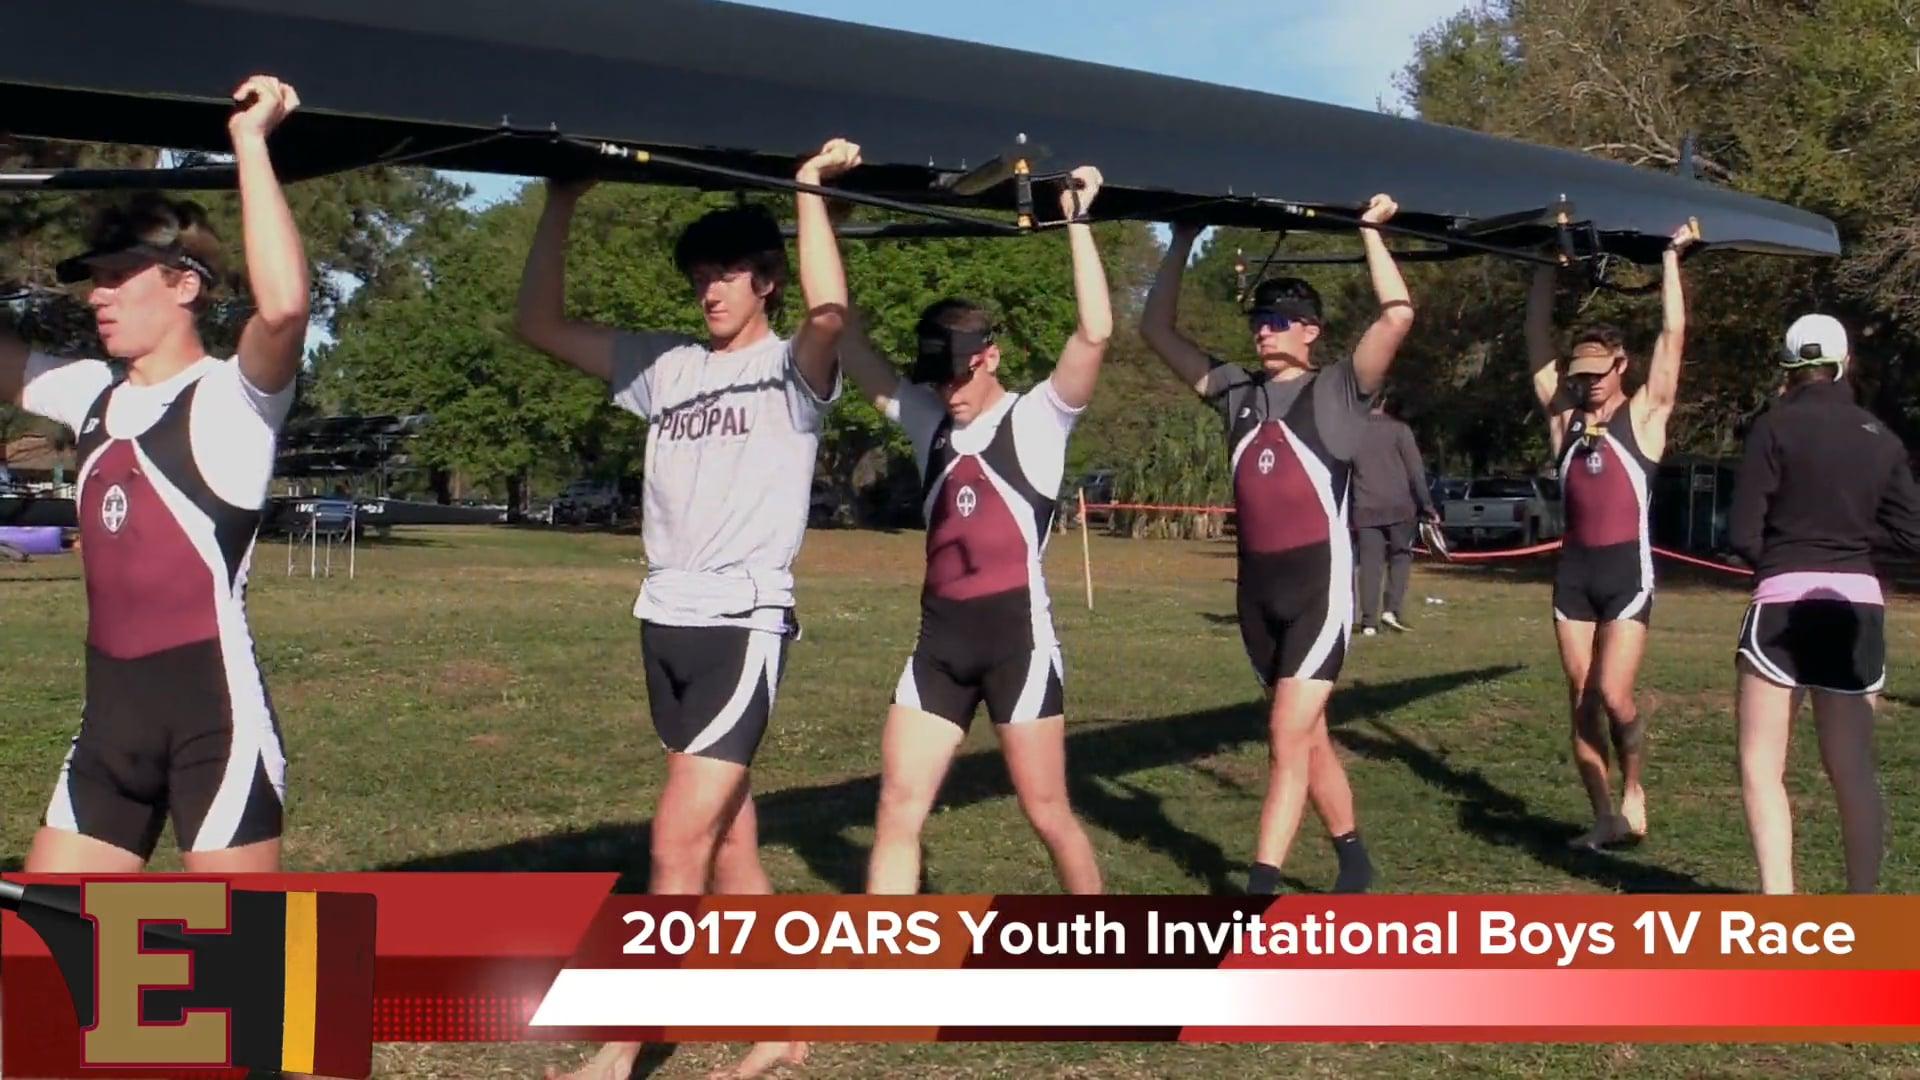 Boys 1V8+ Race 2017 OARS Youth Invitational